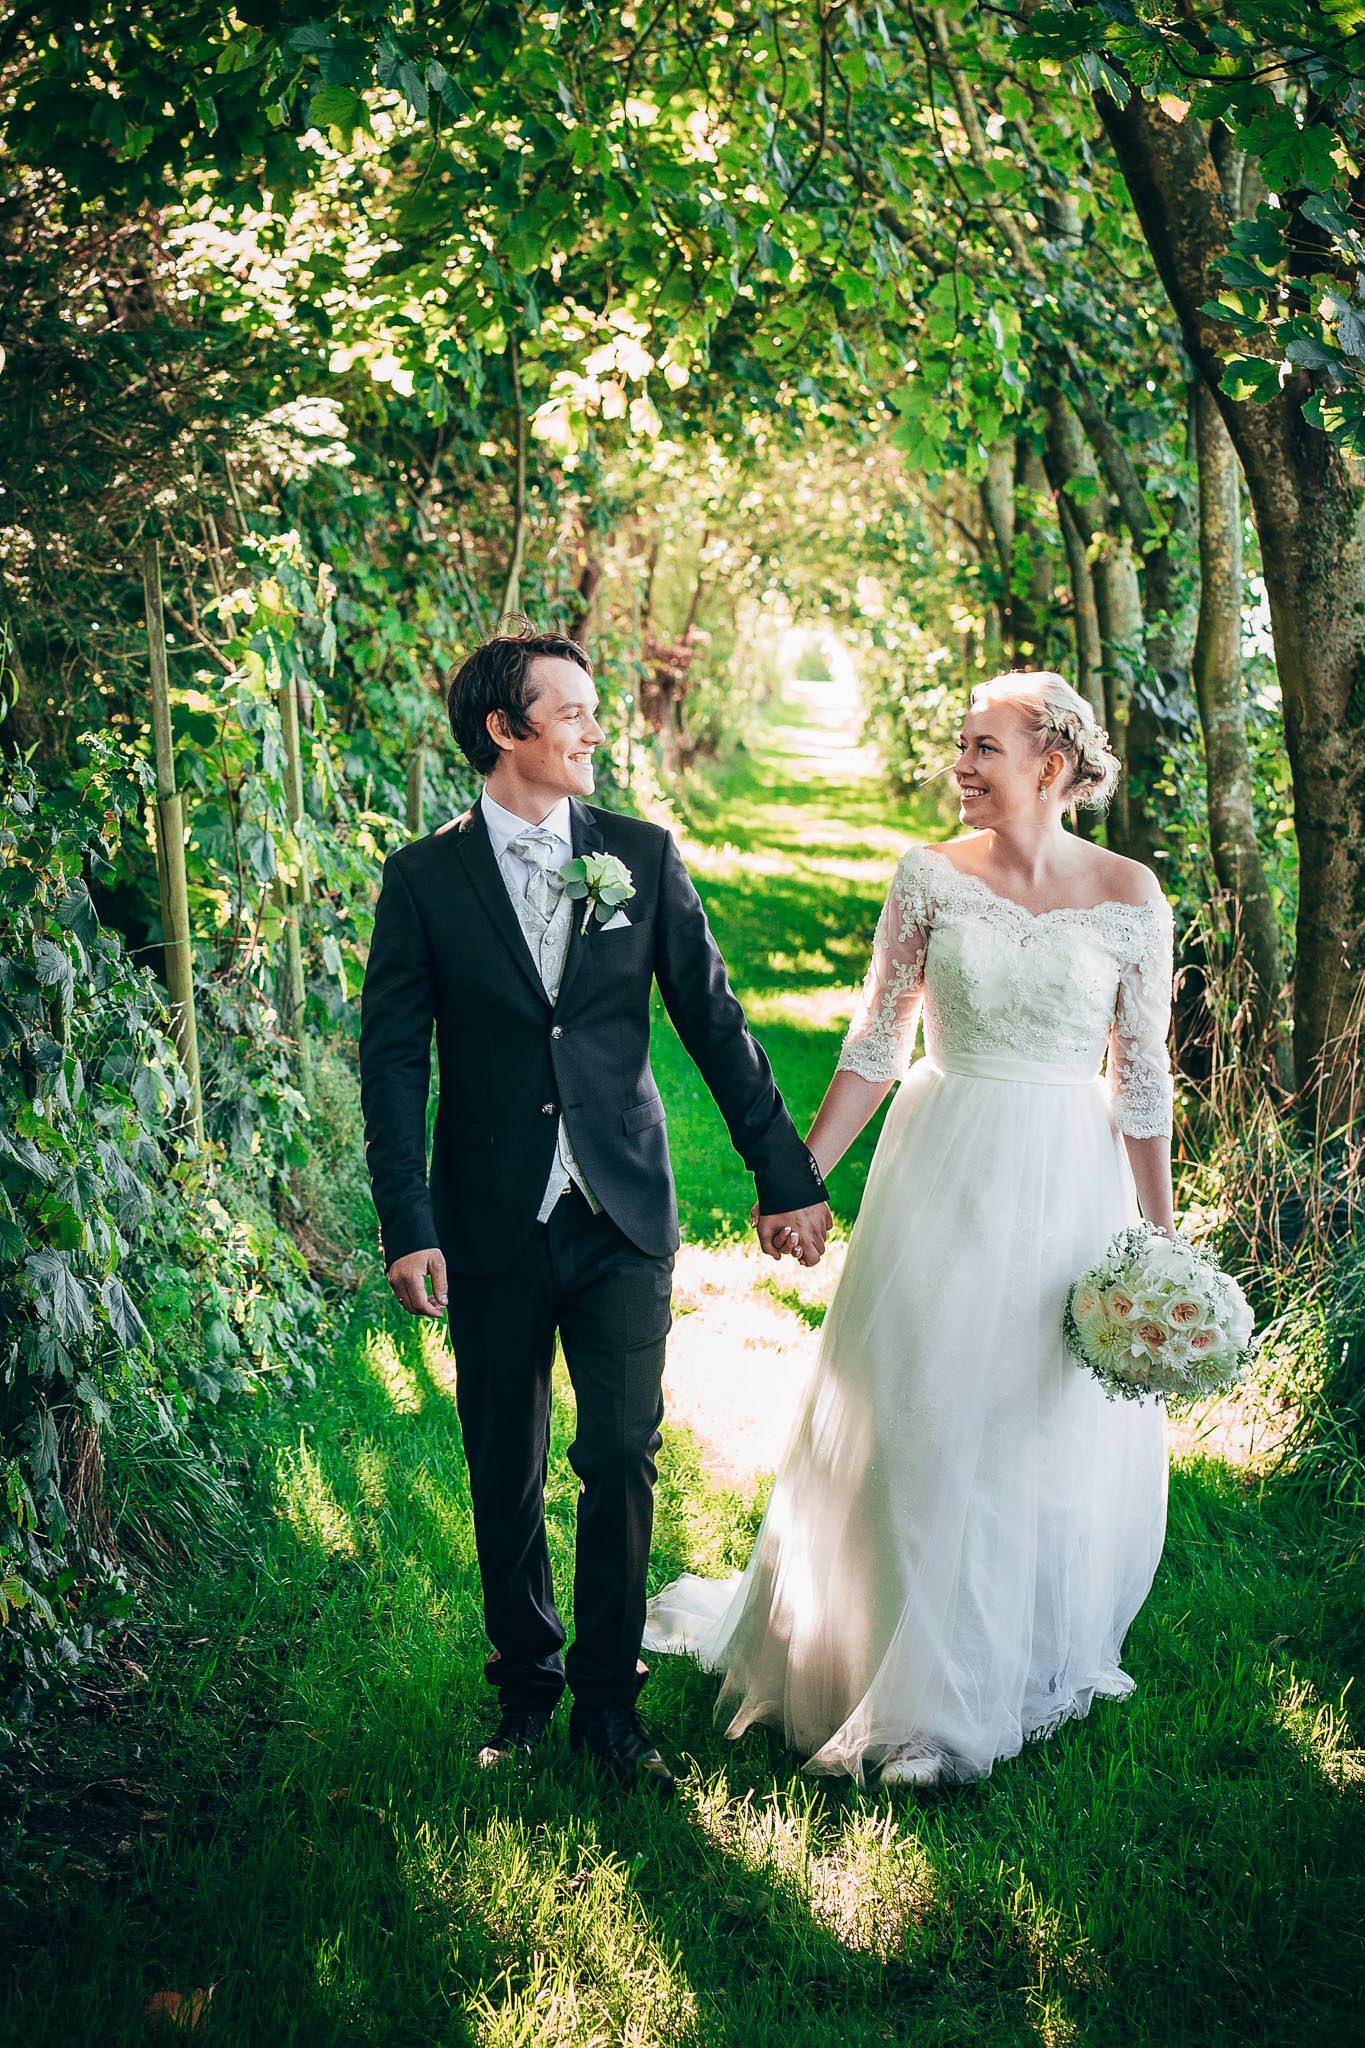 Wedding+Photographer+Norway+Bryllupsfotograf+Casey+Arneson+JT-110.jpg